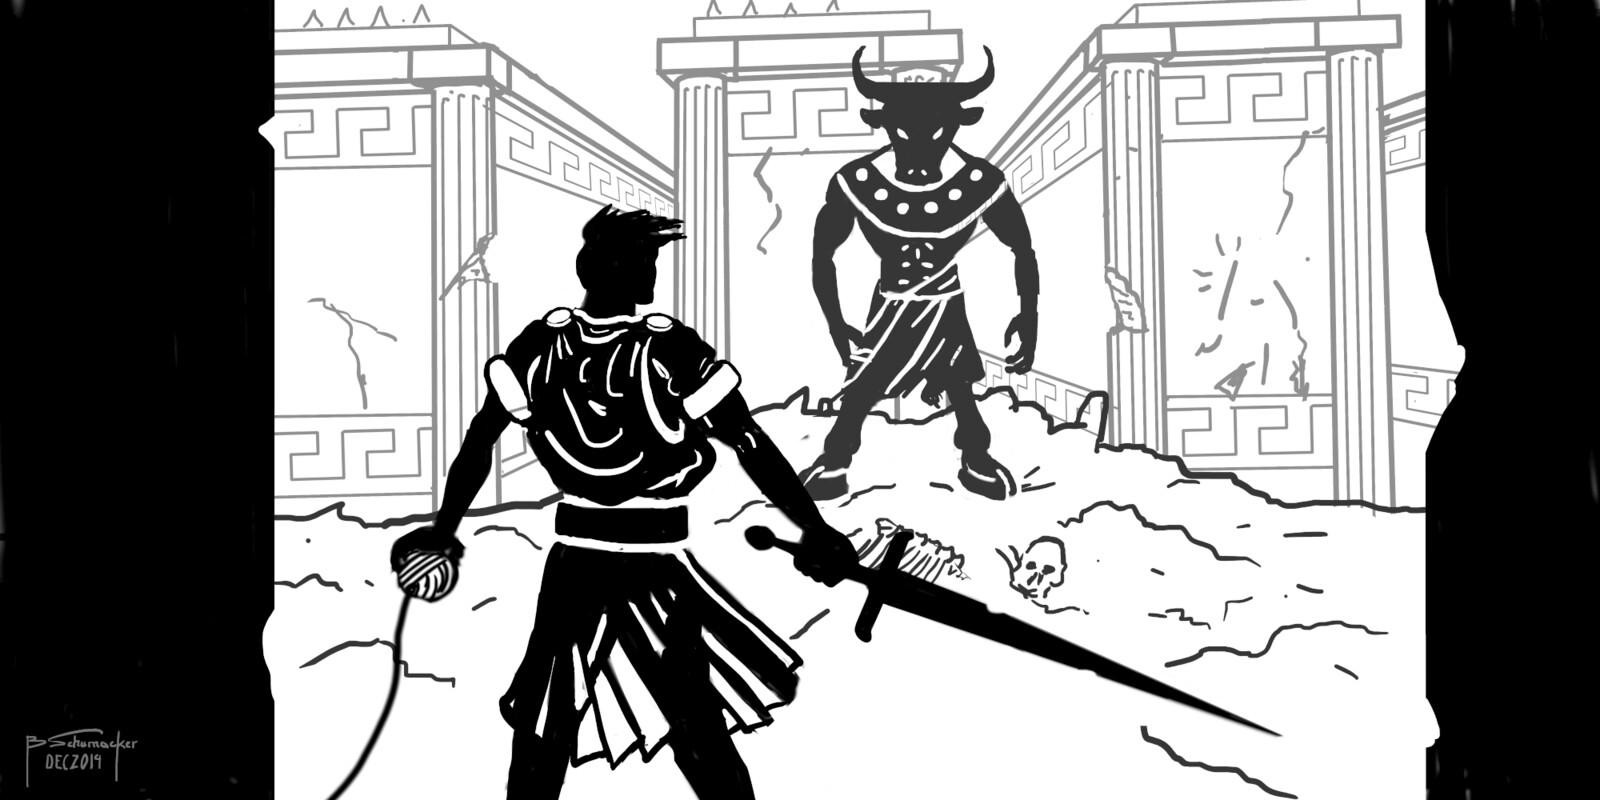 Theseus and Minotaur - draft